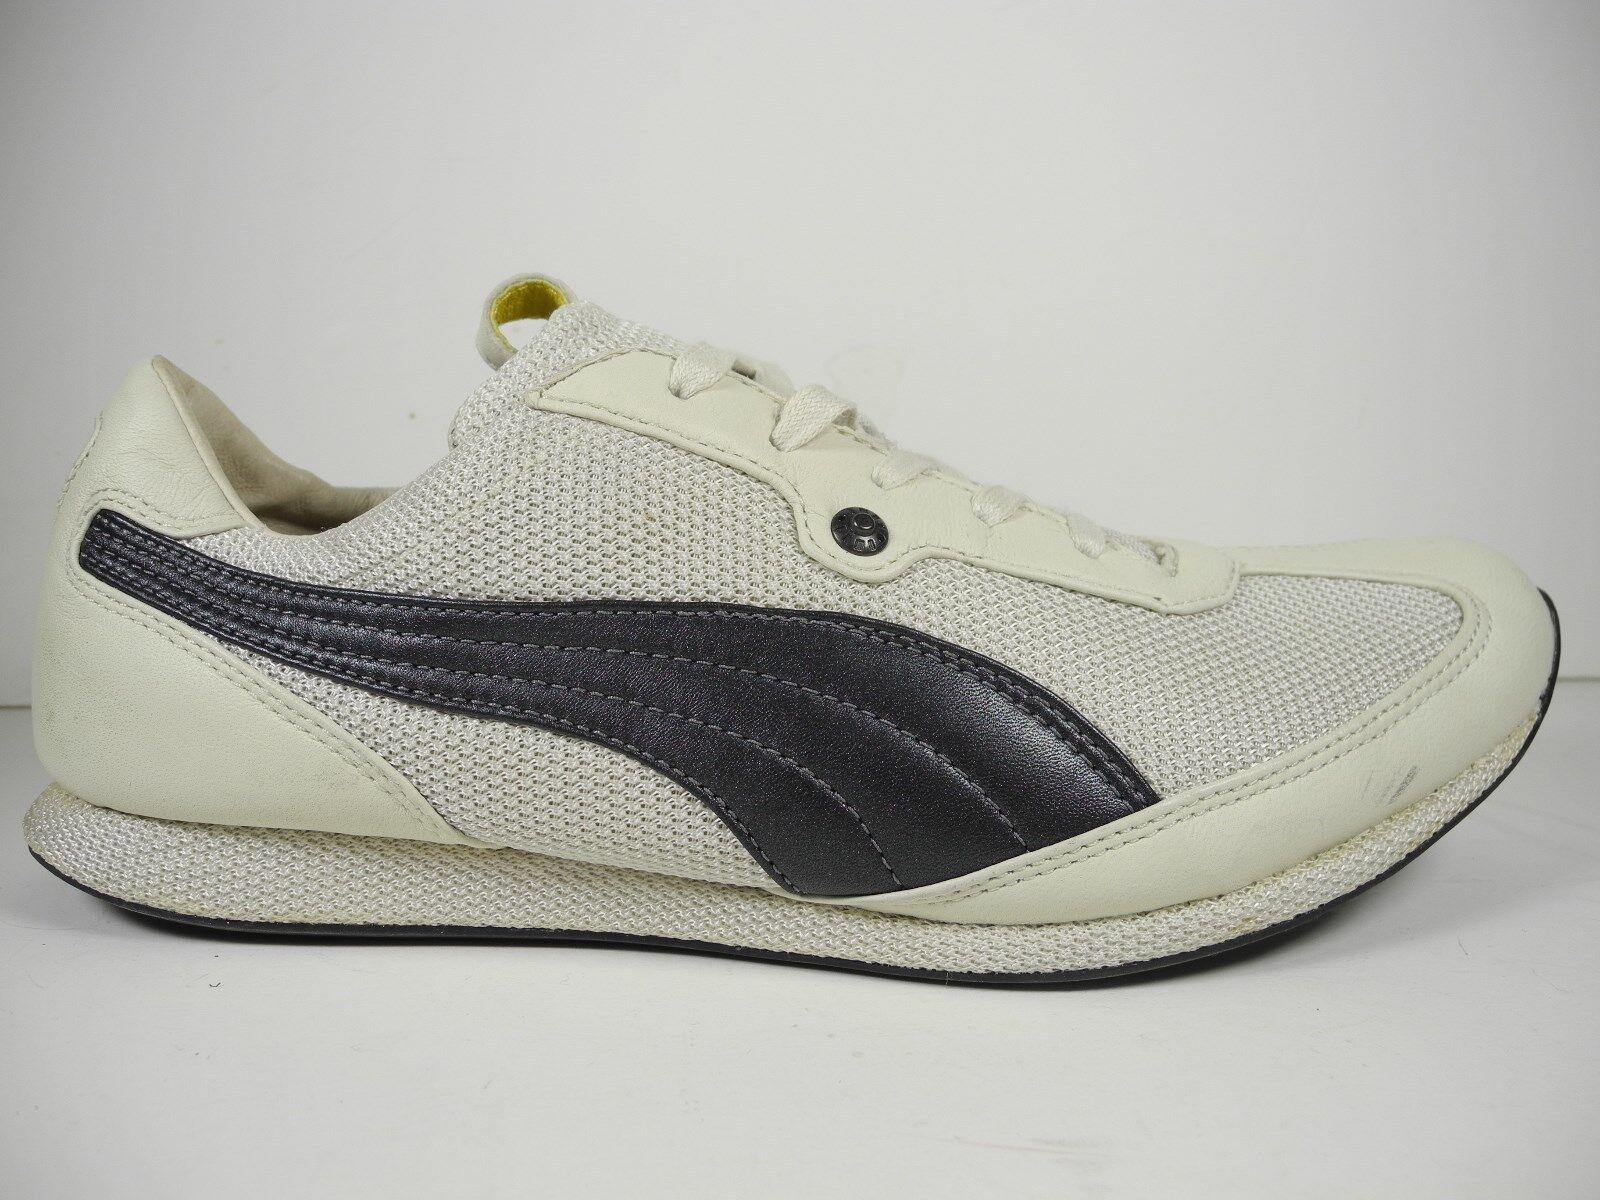 NEW Puma 96 HOURS LANCIO TESSUTO Women's shoes Size 10